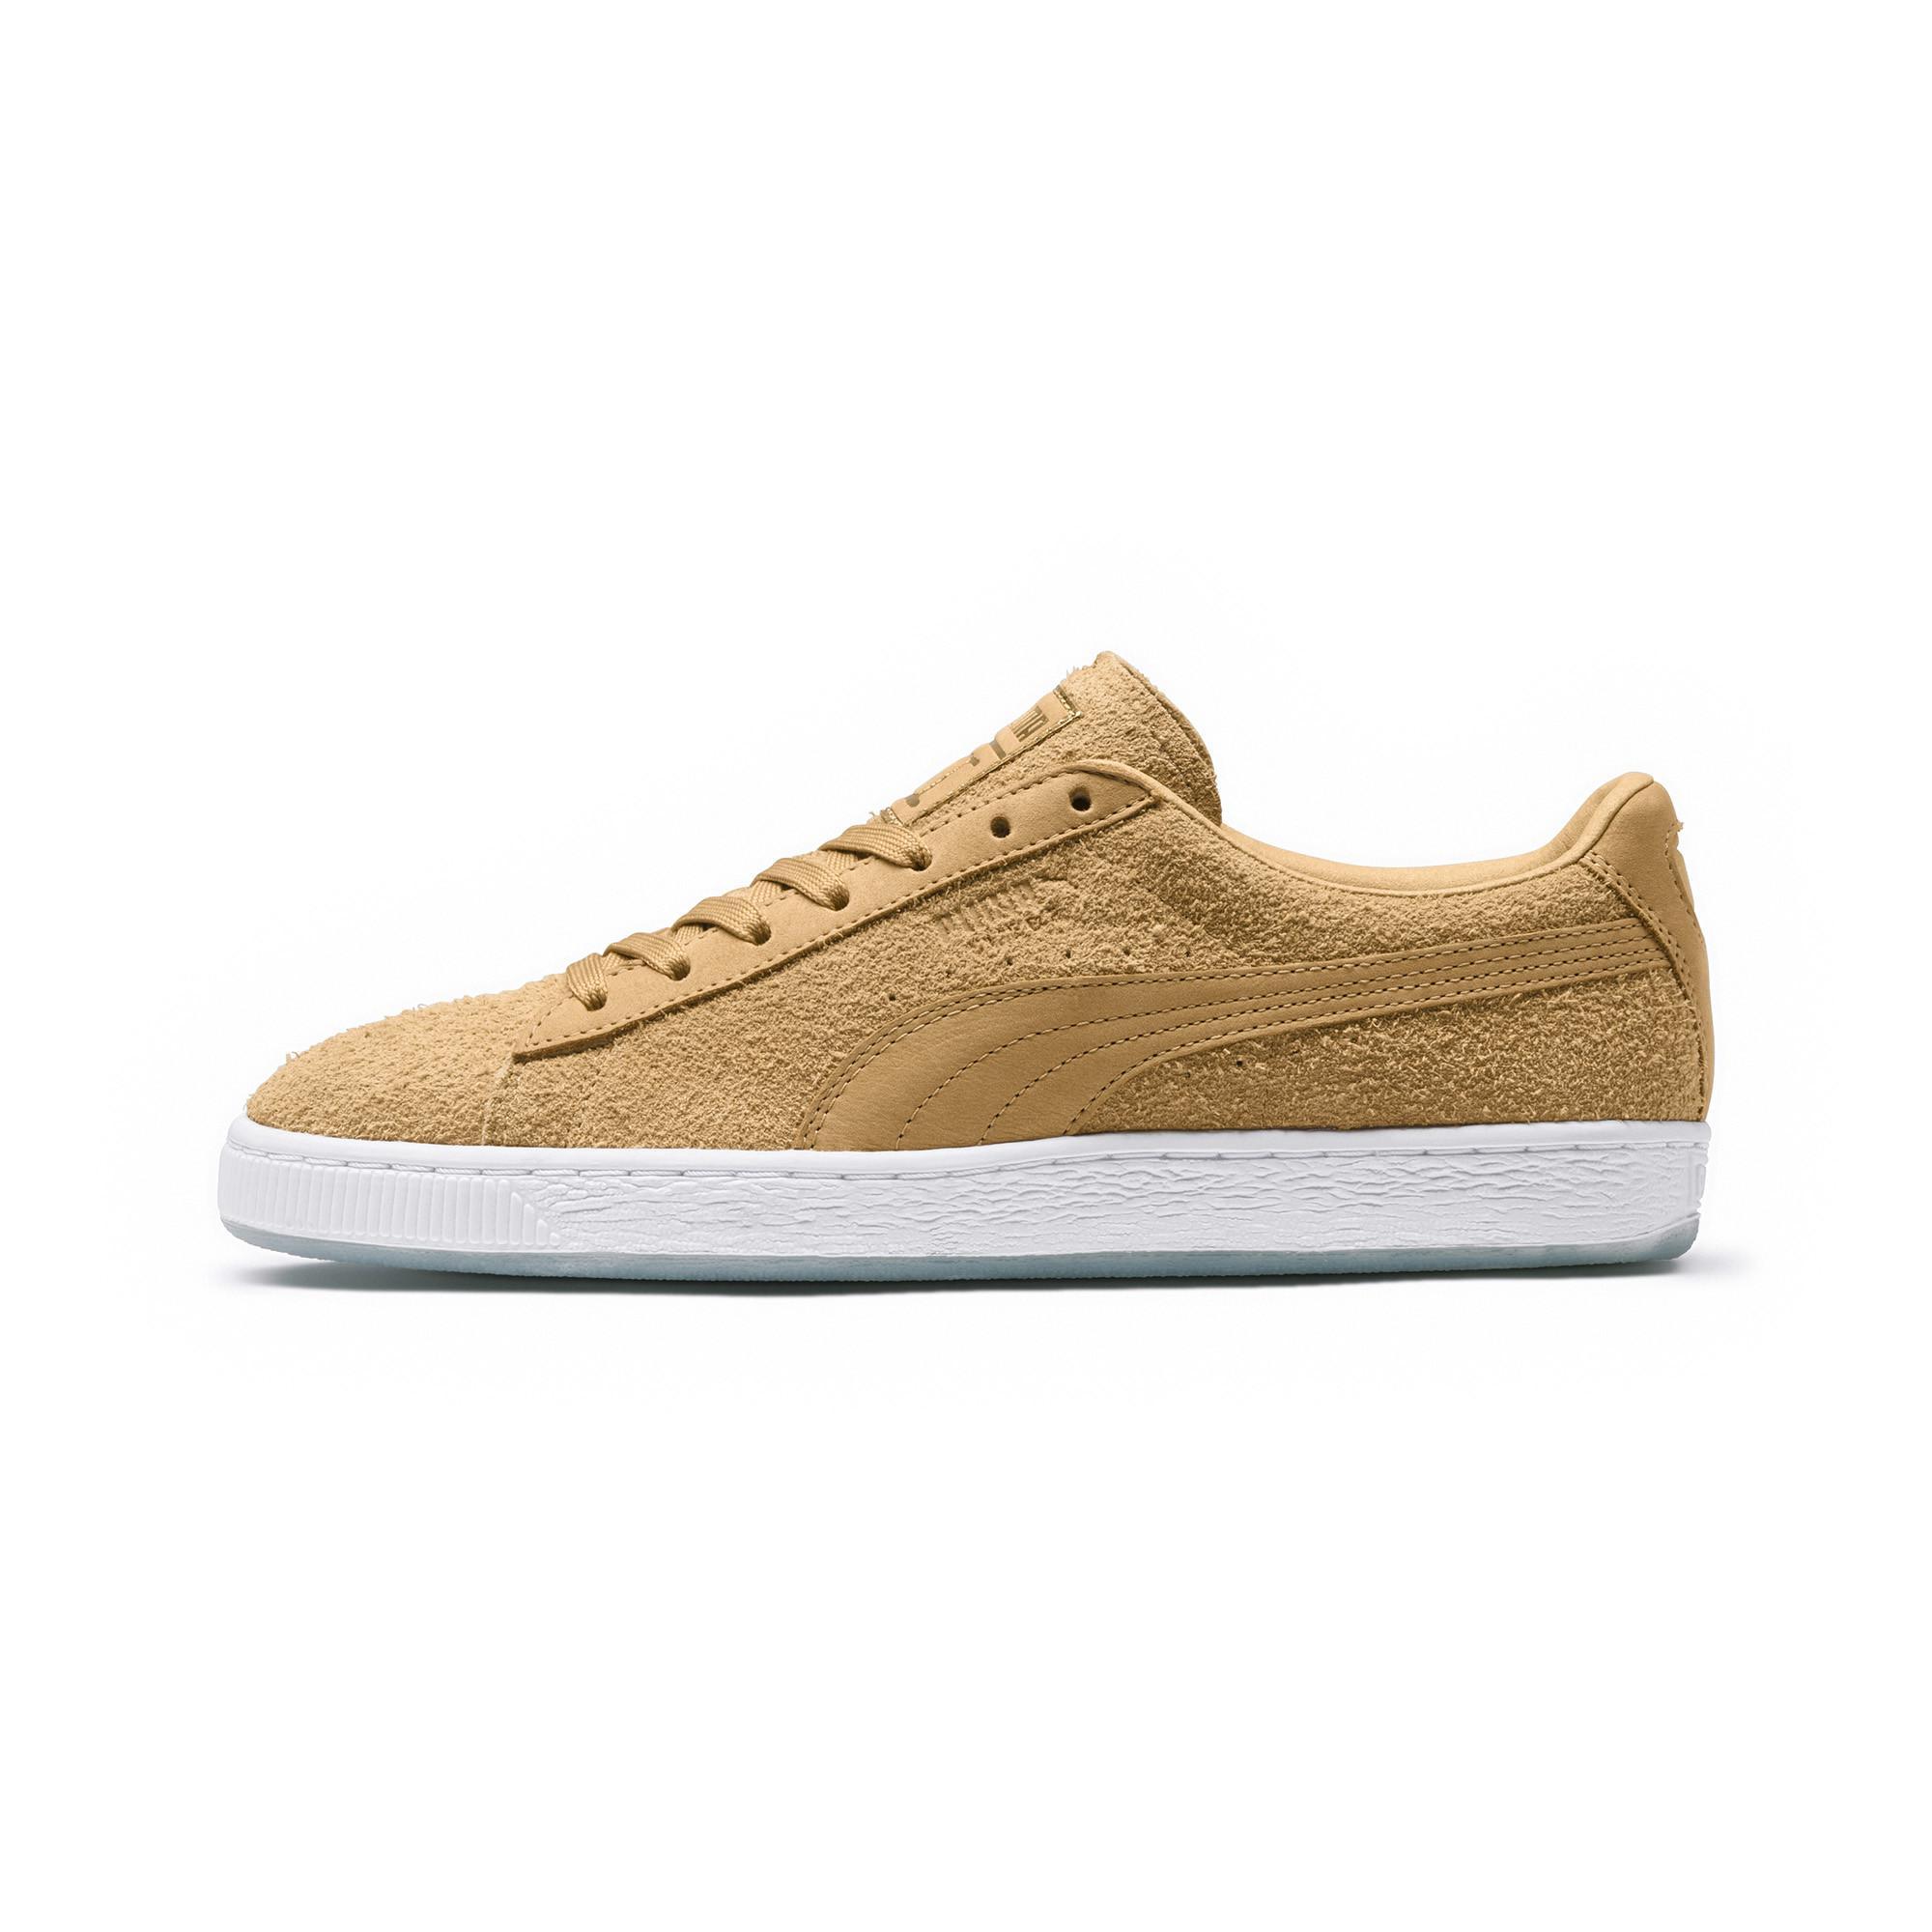 61d8142de86650 Lyst - PUMA X Chapter Ii Suede Classic Sneakers for Men